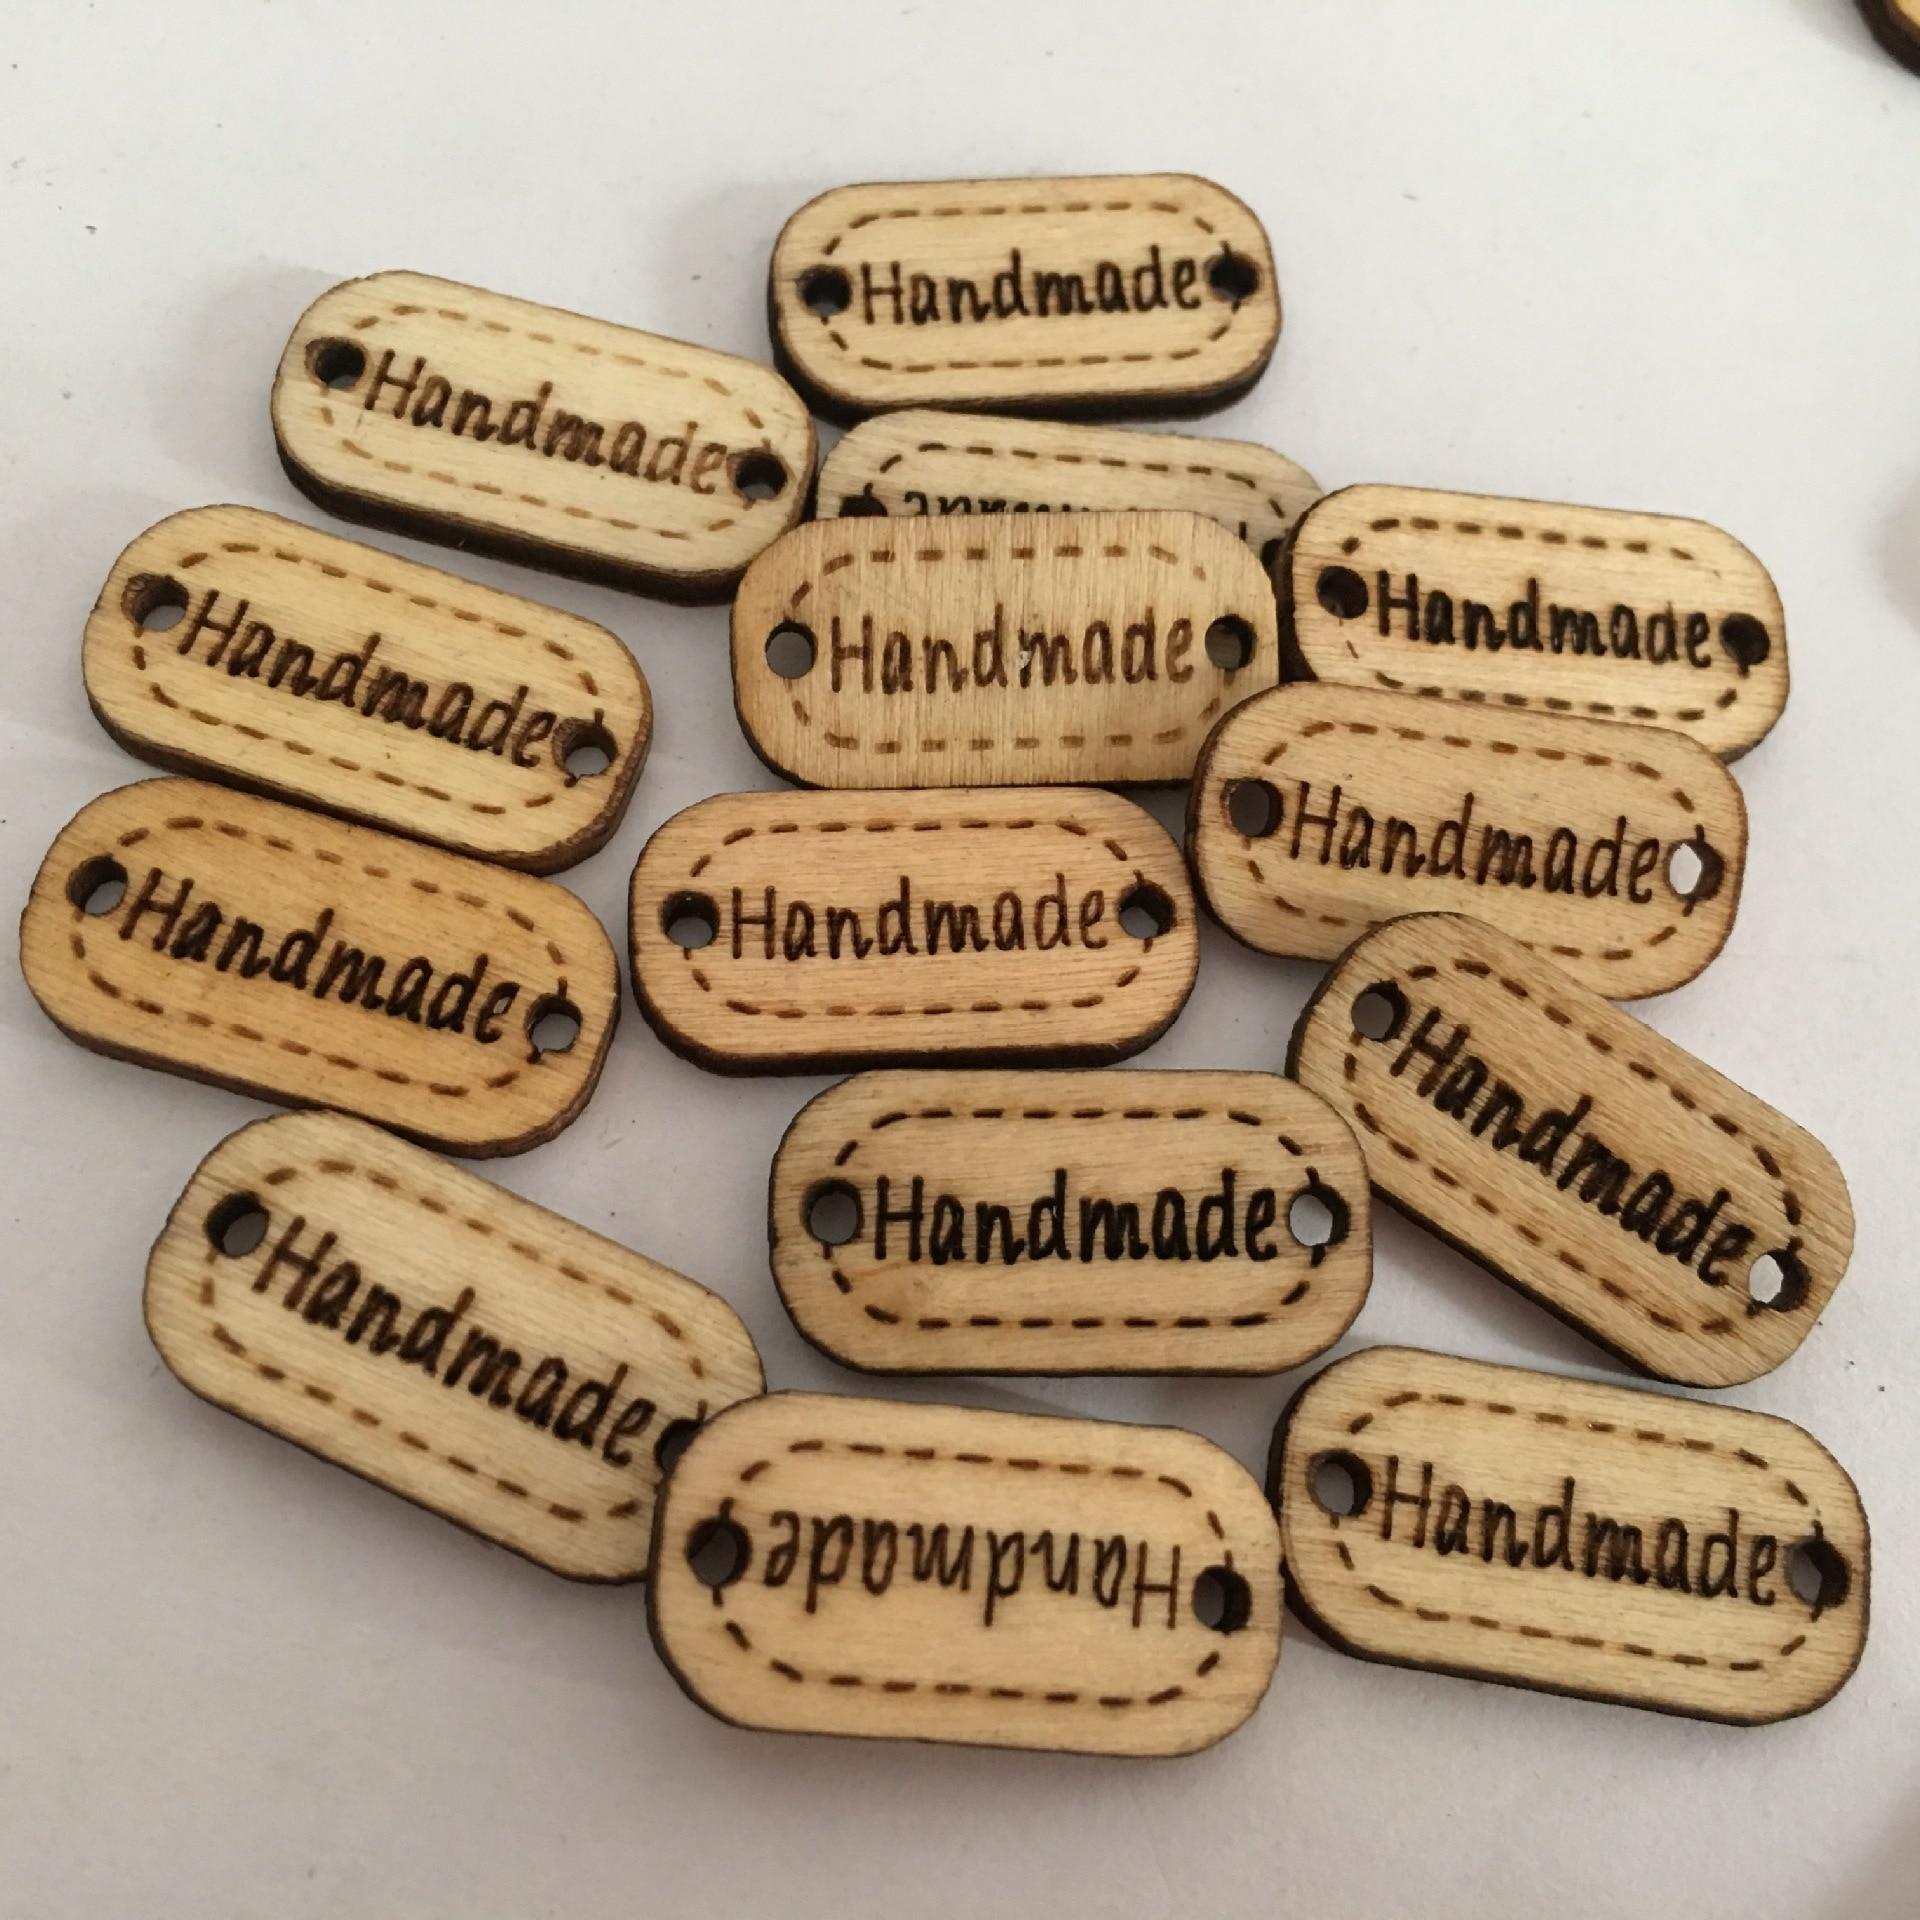 100pcs//set Oval Rectangle Handmade 2 Holes Wood Buttons Crafts Scrapbooking DIY